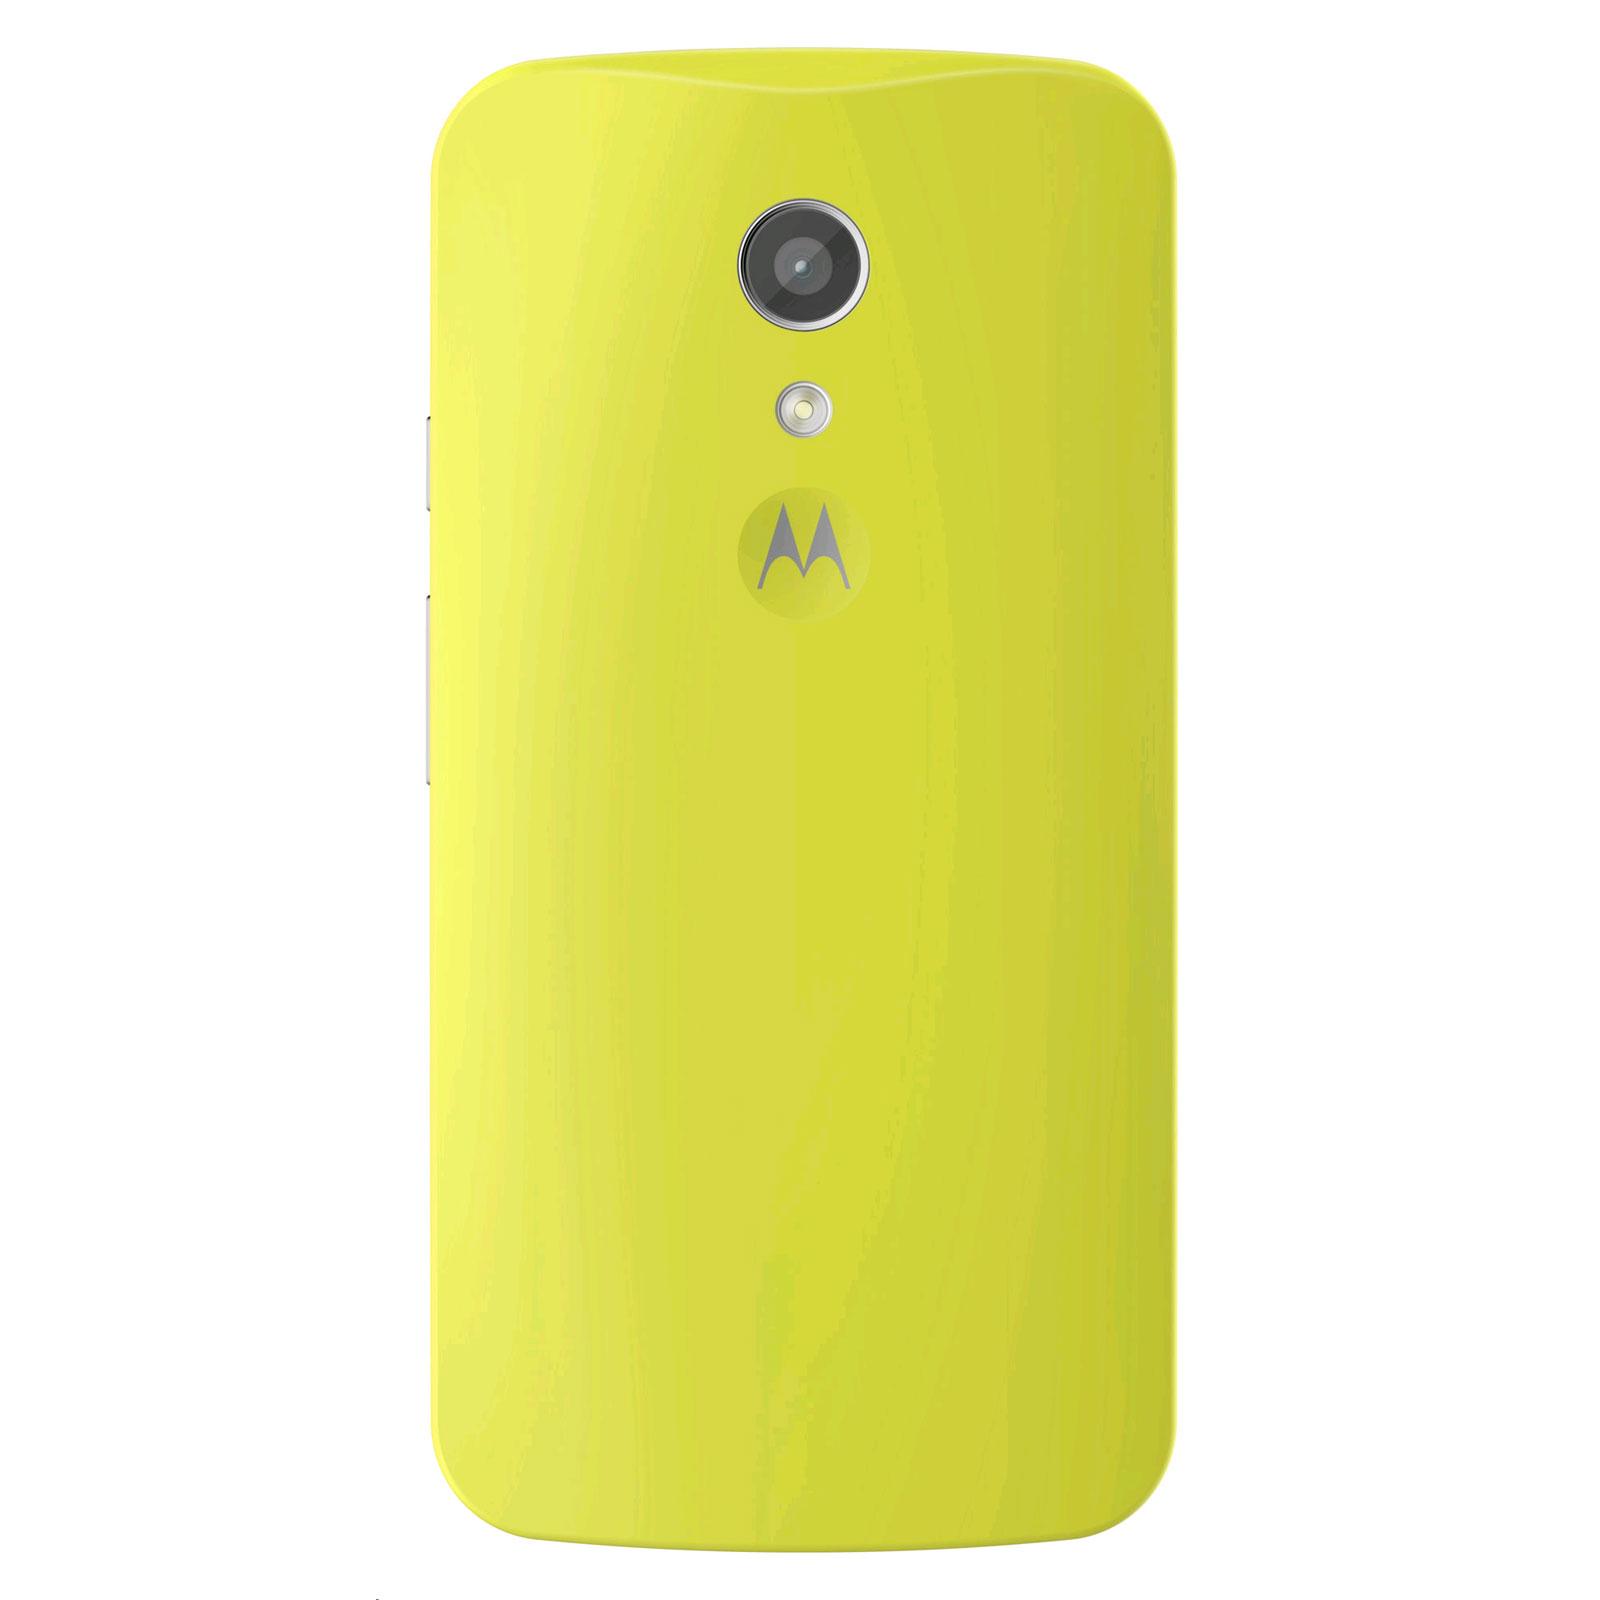 Motorola Coque D Origine Vert Lime Motorola Moto G 2 232 Me